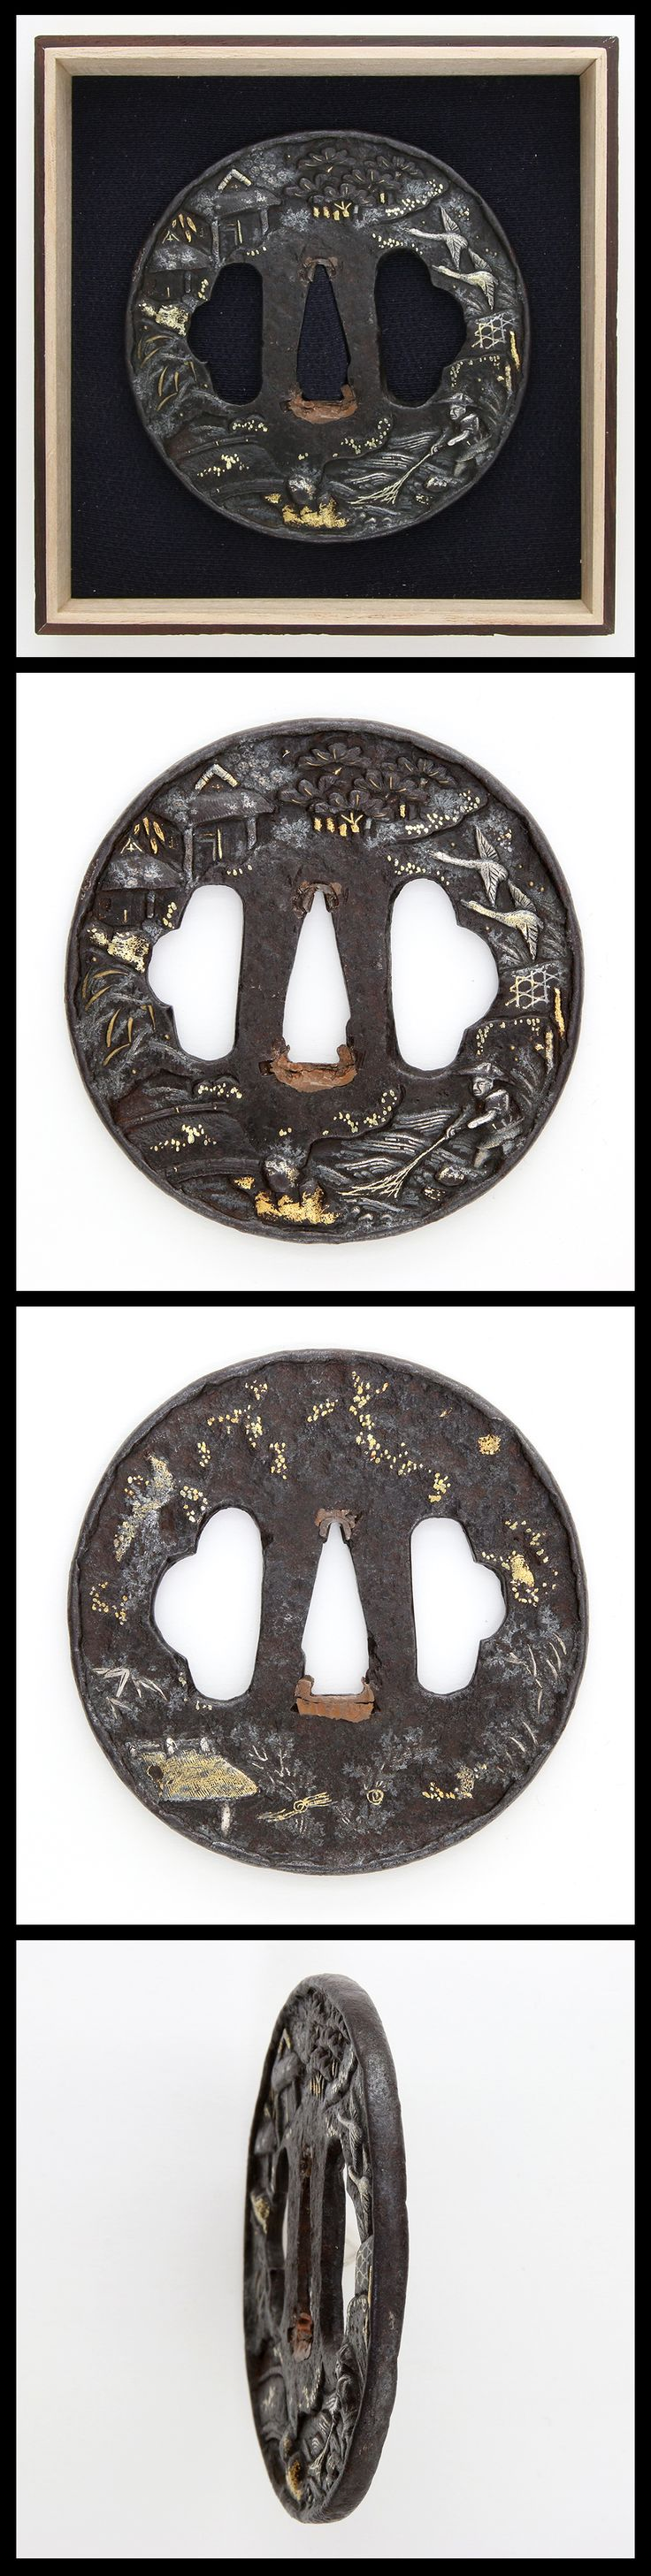 Edo Round shape iron Sukidasi Takabori gold and silver inlaid Tsuba with Sukidashi rim and huge hole for Hitu on both sides.